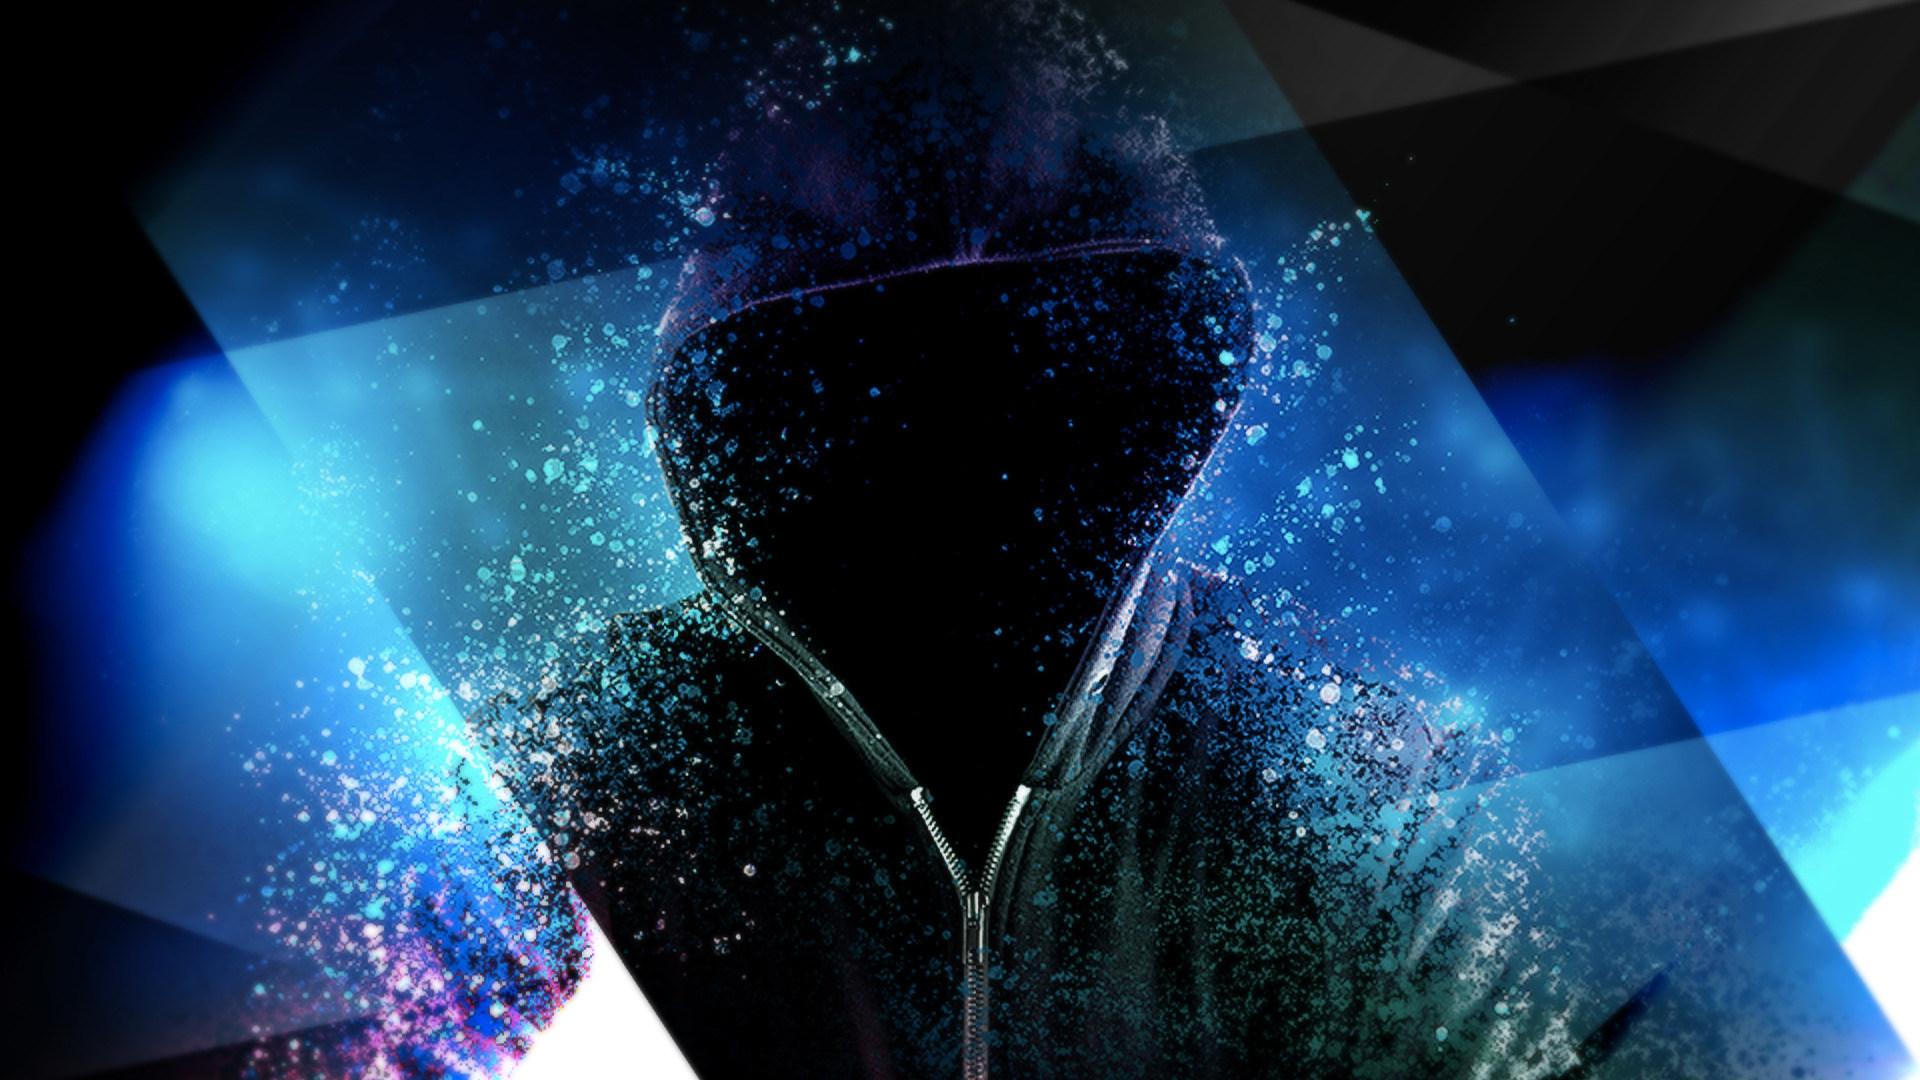 Sicherheit, Sicherheitslücke, Leak, Hacker, Malware, Security, Hack, Angriff, Trojaner, Virus, Kriminalität, Schadsoftware, Exploit, Cybercrime, Hacking, Cybersecurity, Hackerangriff, Internetkriminalität, Warnung, Hacken, Darknet, Hacker Angriffe, Hacker Angriff, Ransom, Attack, Hacks, Viren, Gehackt, Schädling, schloss, China Hacker, Adware, Russische Hacker, Security Report, Crime, Security Bulletin, Promi-Hacker, Achtung, Hinweis, Attantion, Warning, Warn, Kutte, Umhang